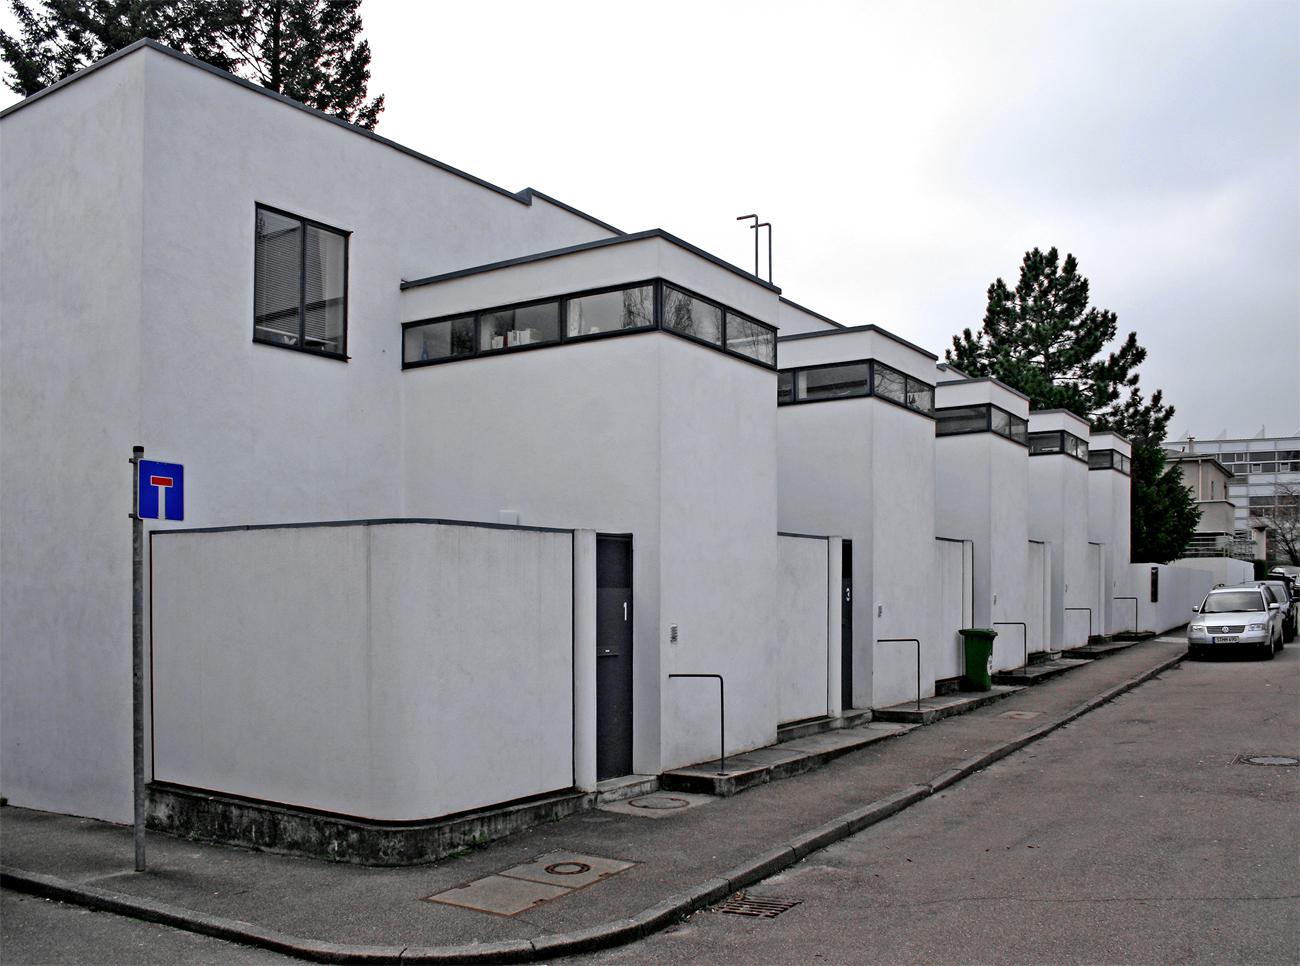 La arquitectura holandesa on emaze for Arquitectura holandesa